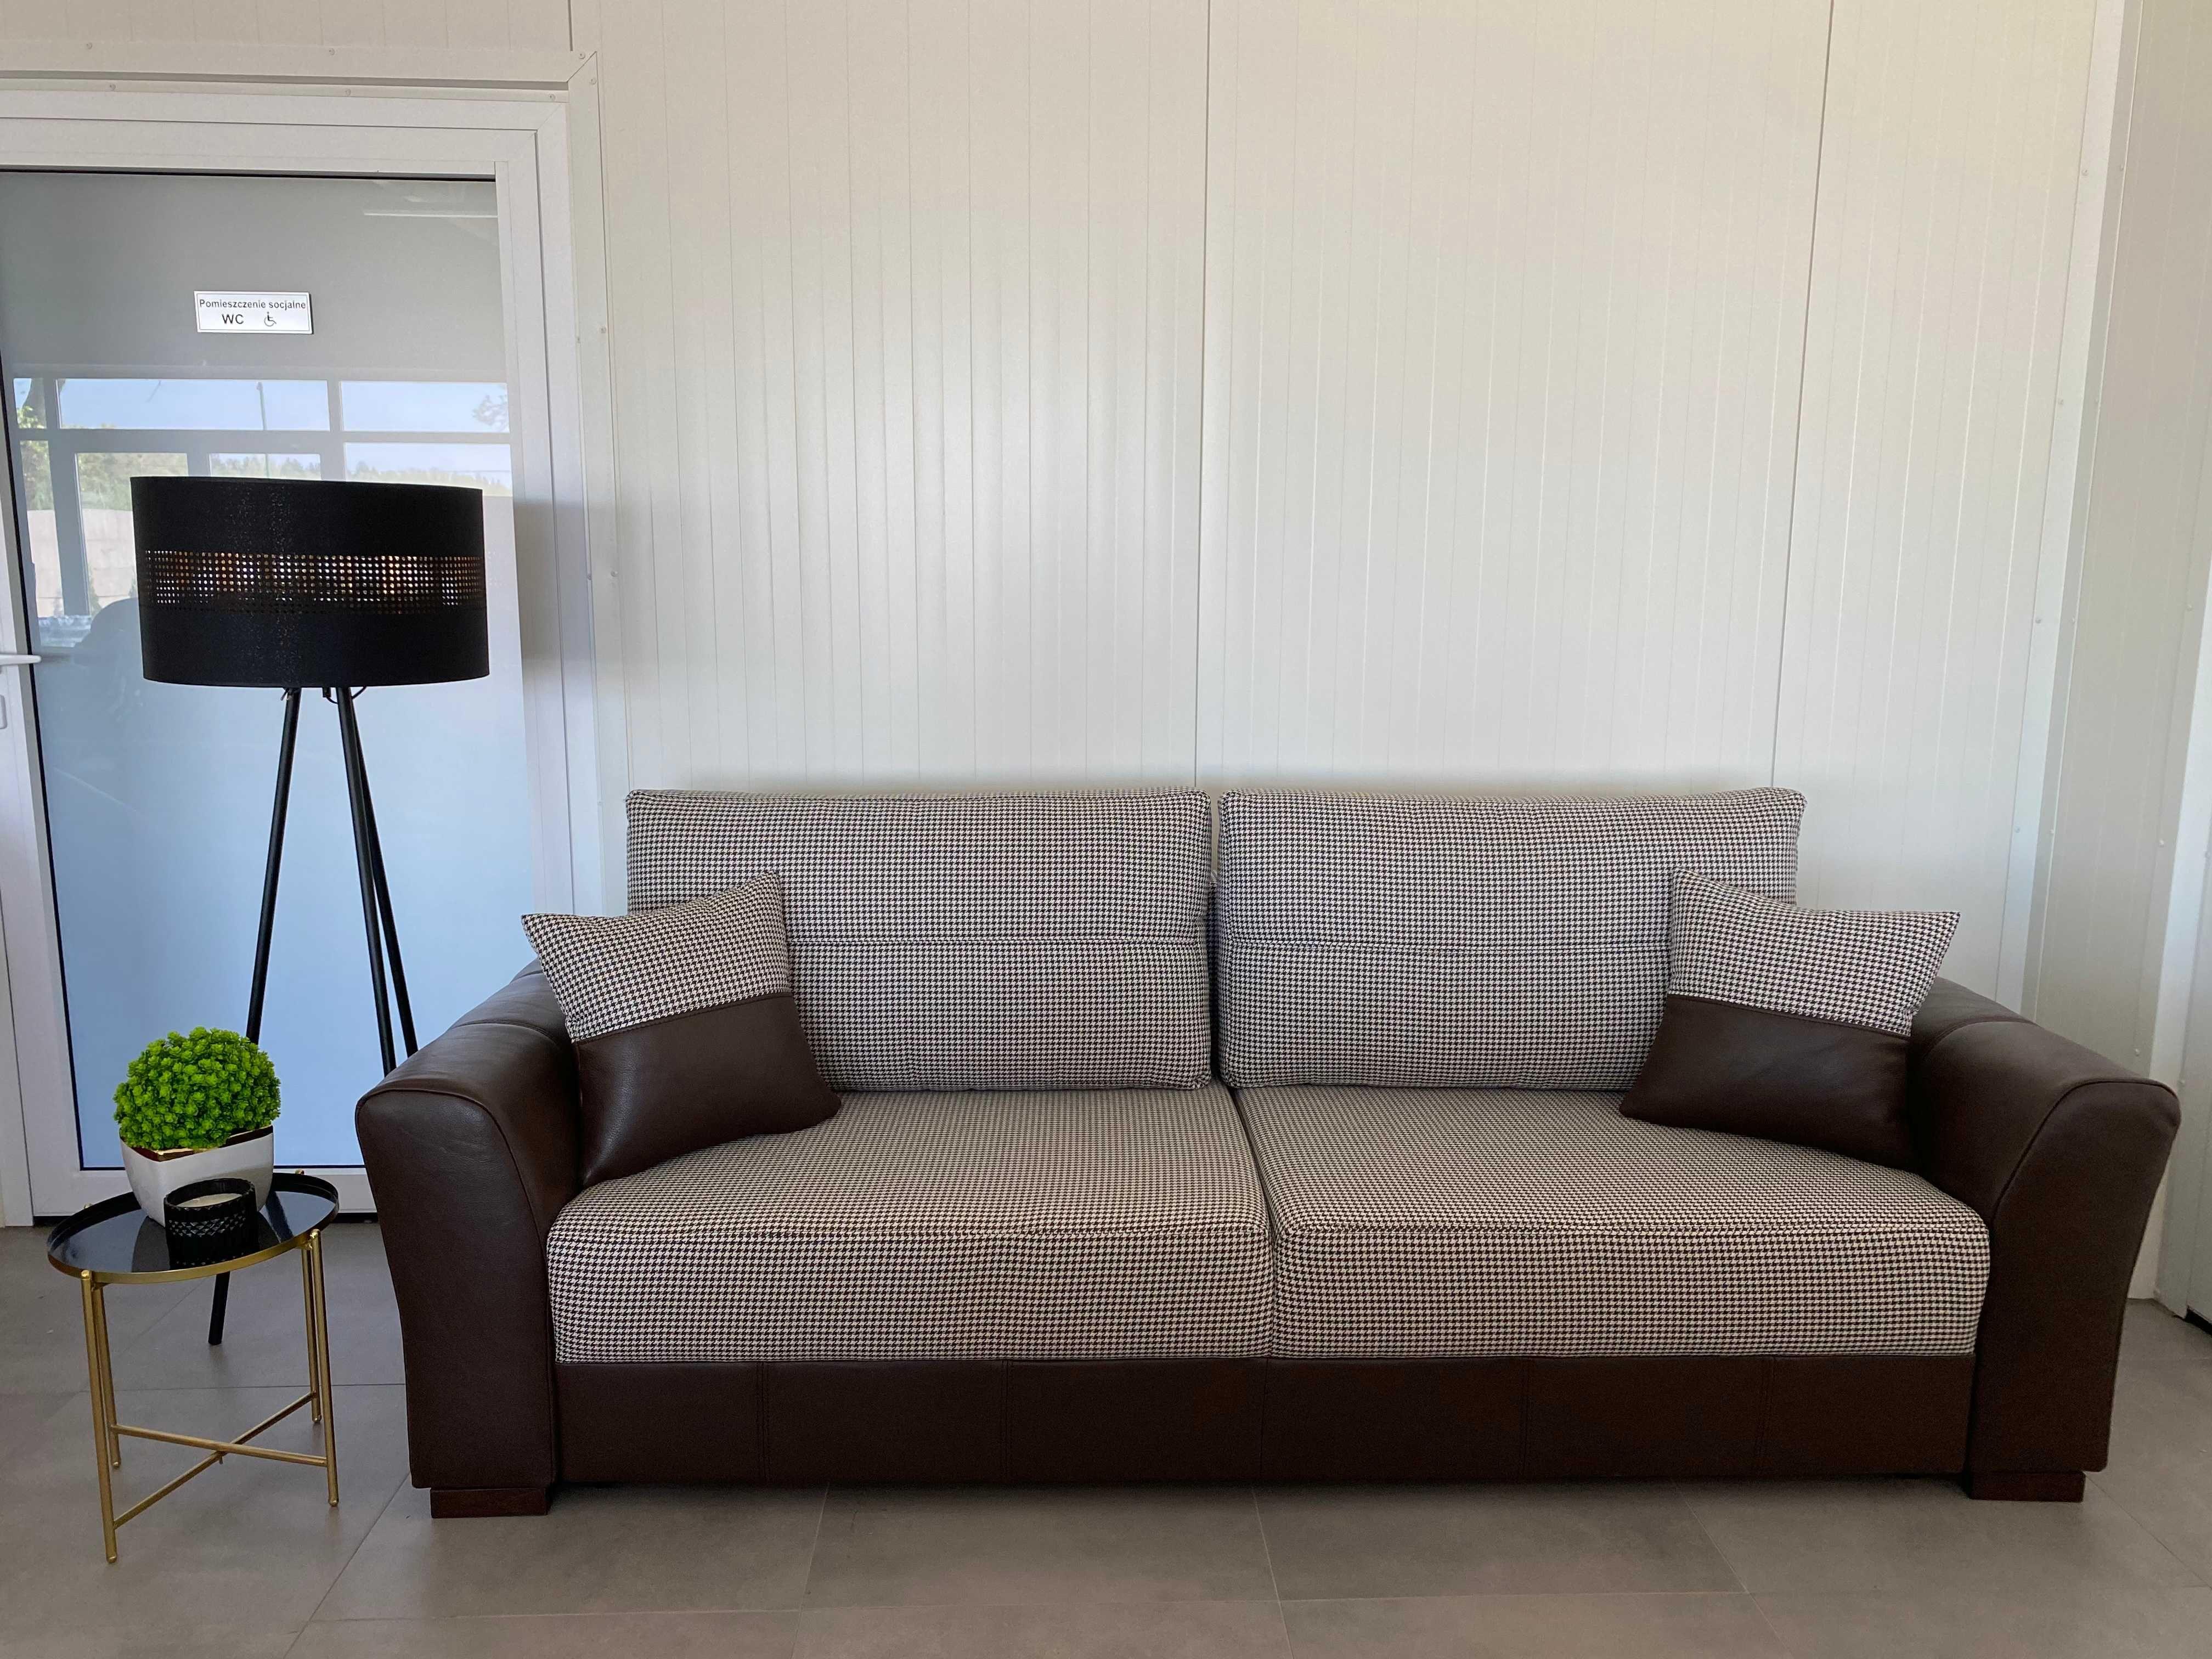 Sofa, kanapa rozkładana JM, skóra naturalna+ tkanina, dostępna od ręki